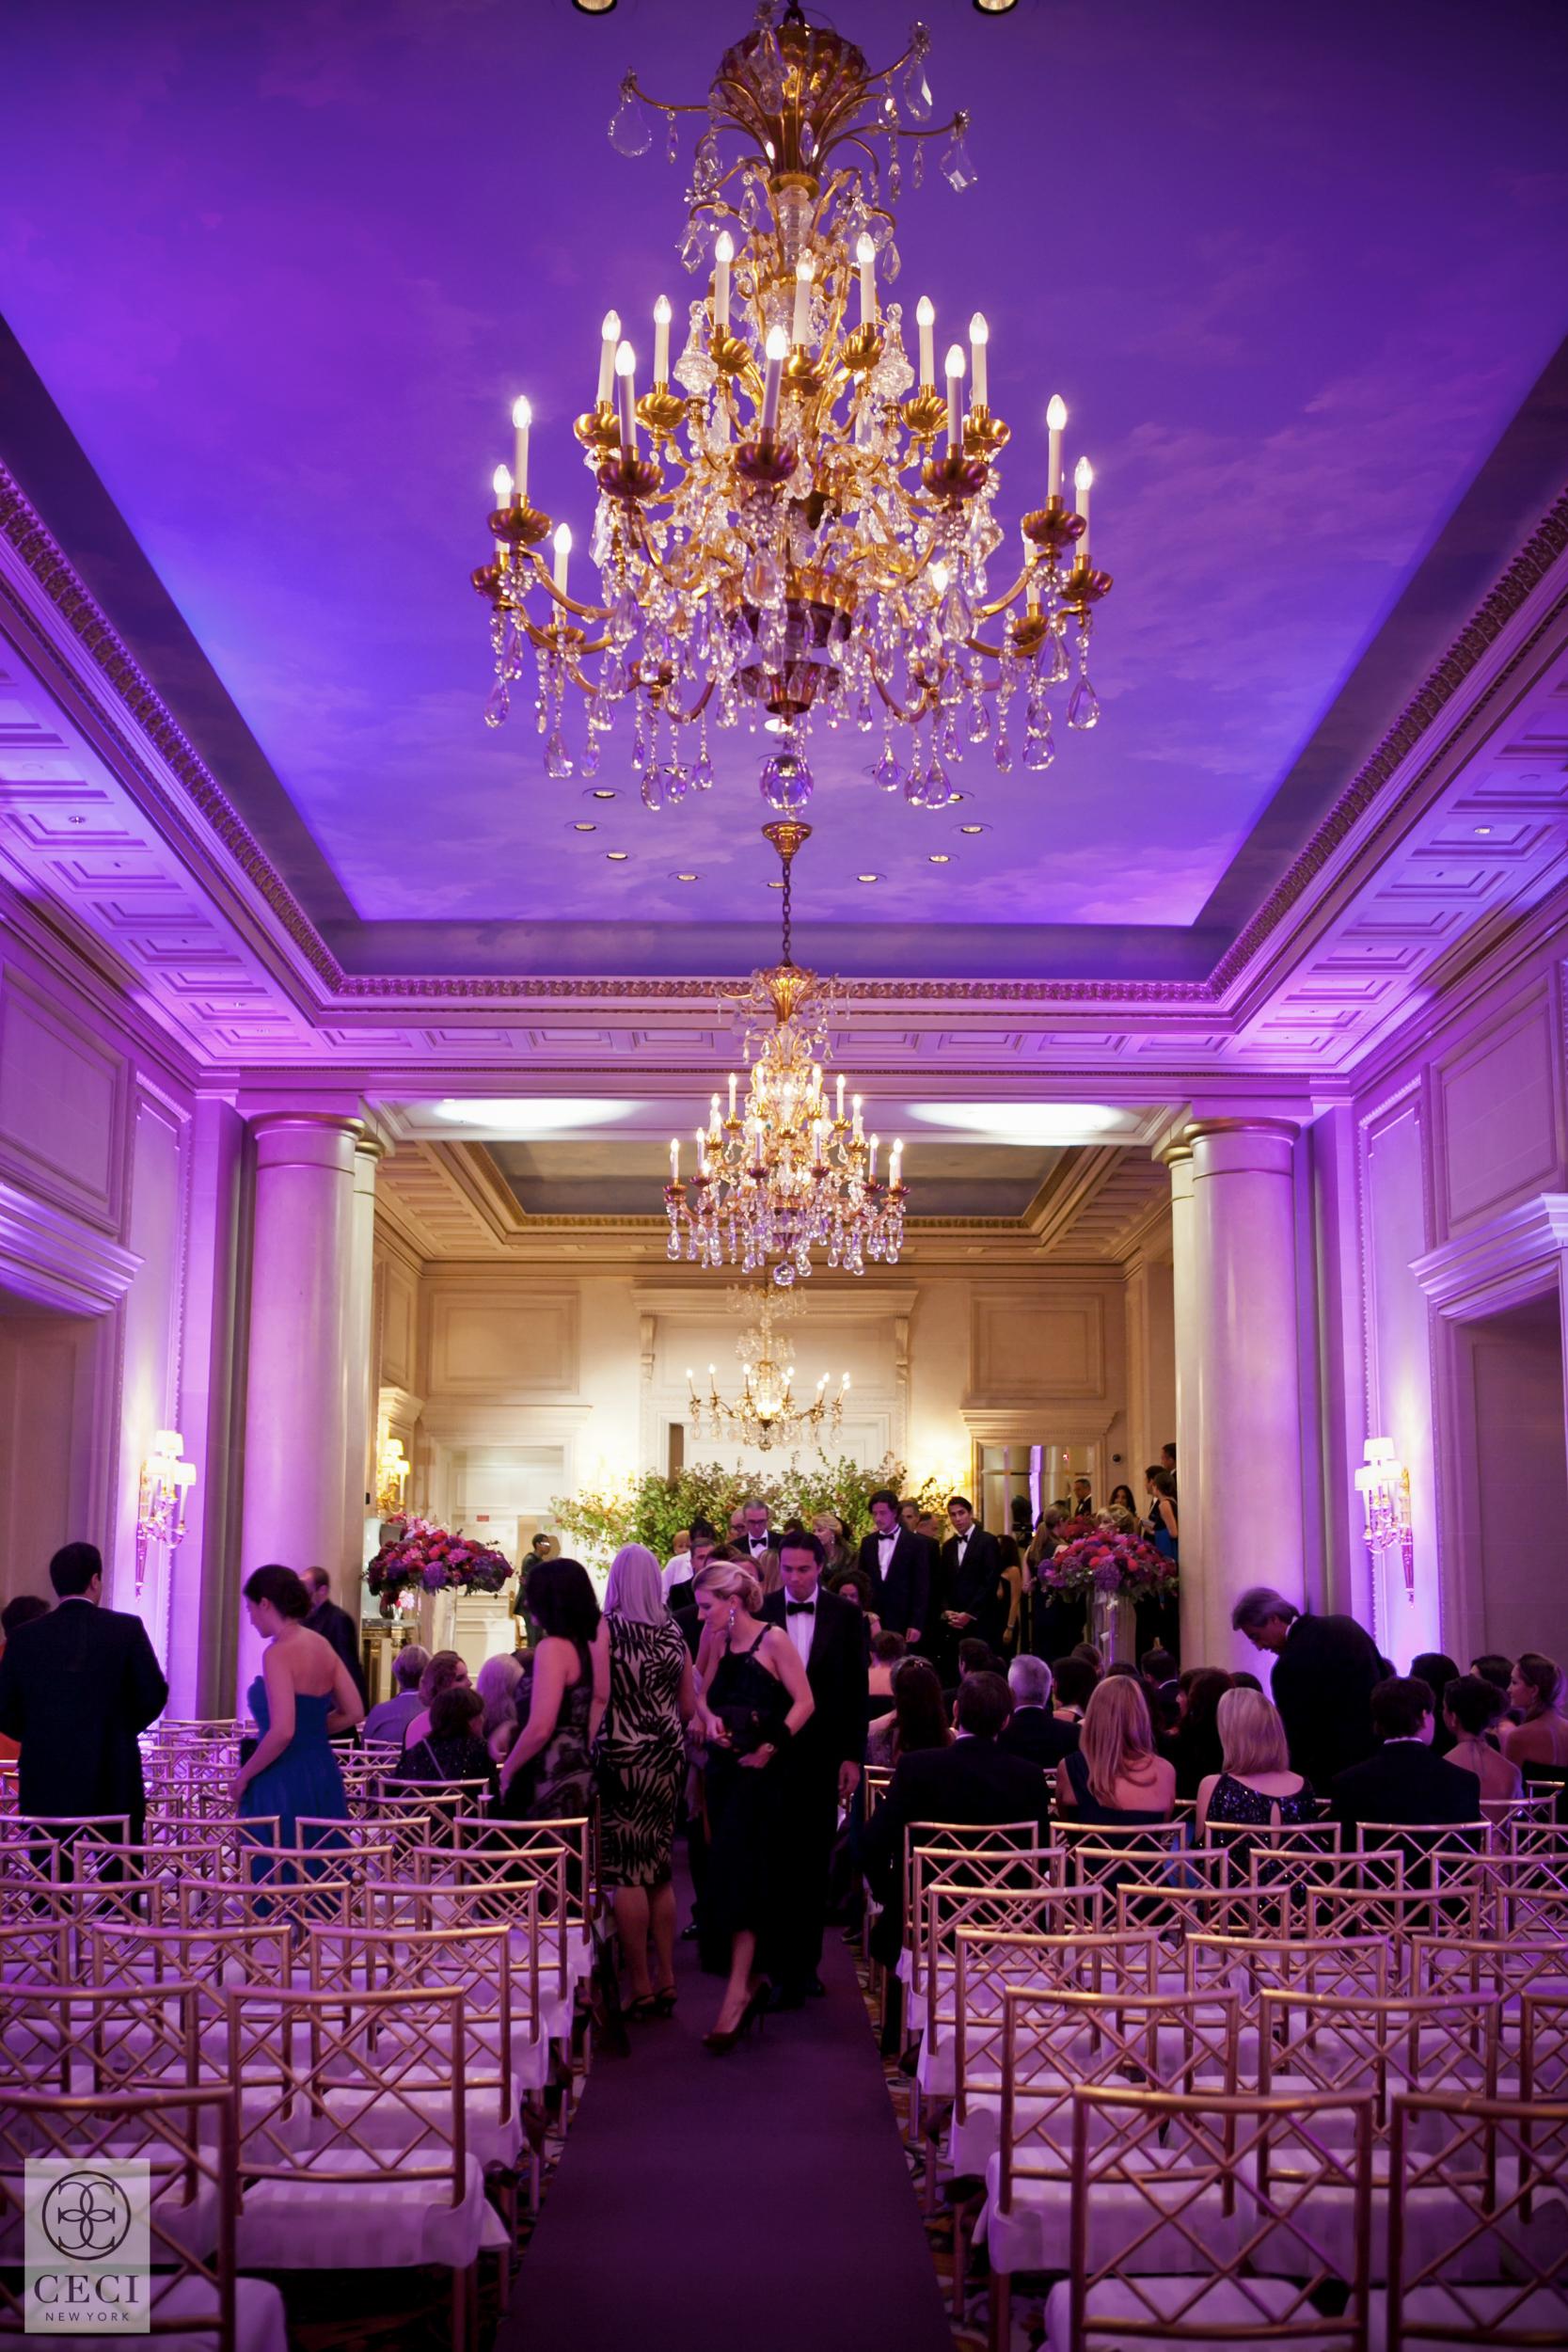 ceci_new_york_lucas_somoza_purple_regal_wediding_birthday_commitment_ceremony_gold-55.jpg